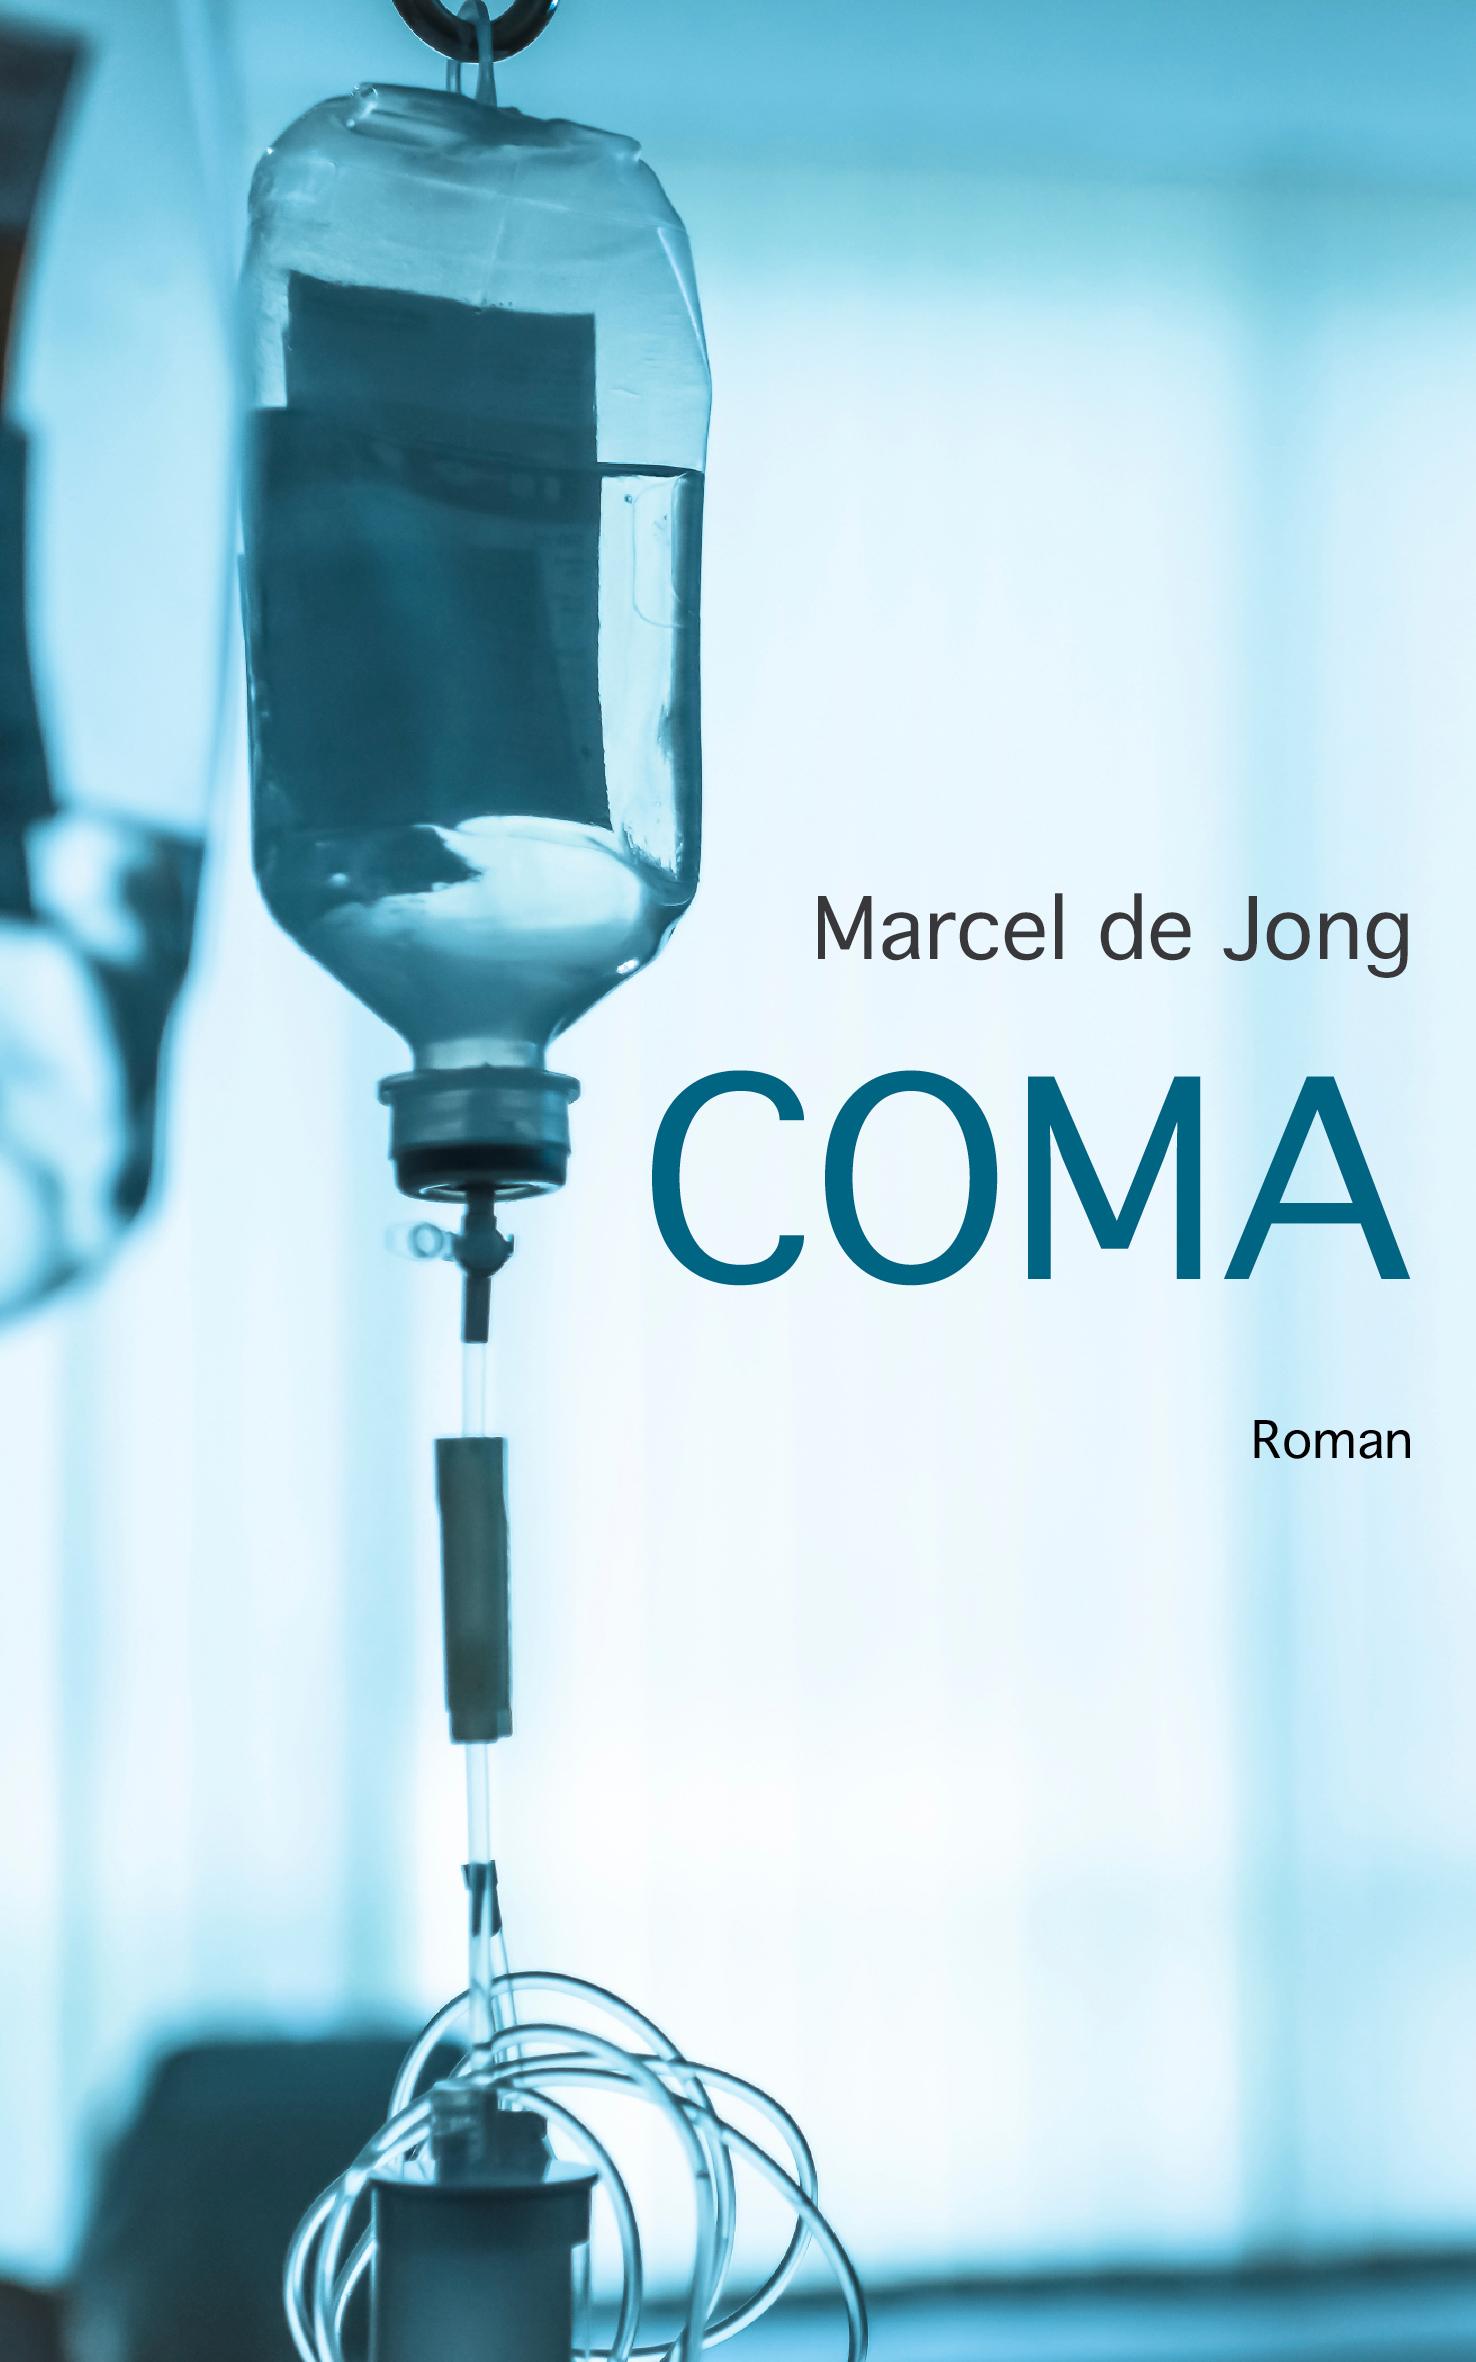 COMA-Marcel de Jong_HR (1)